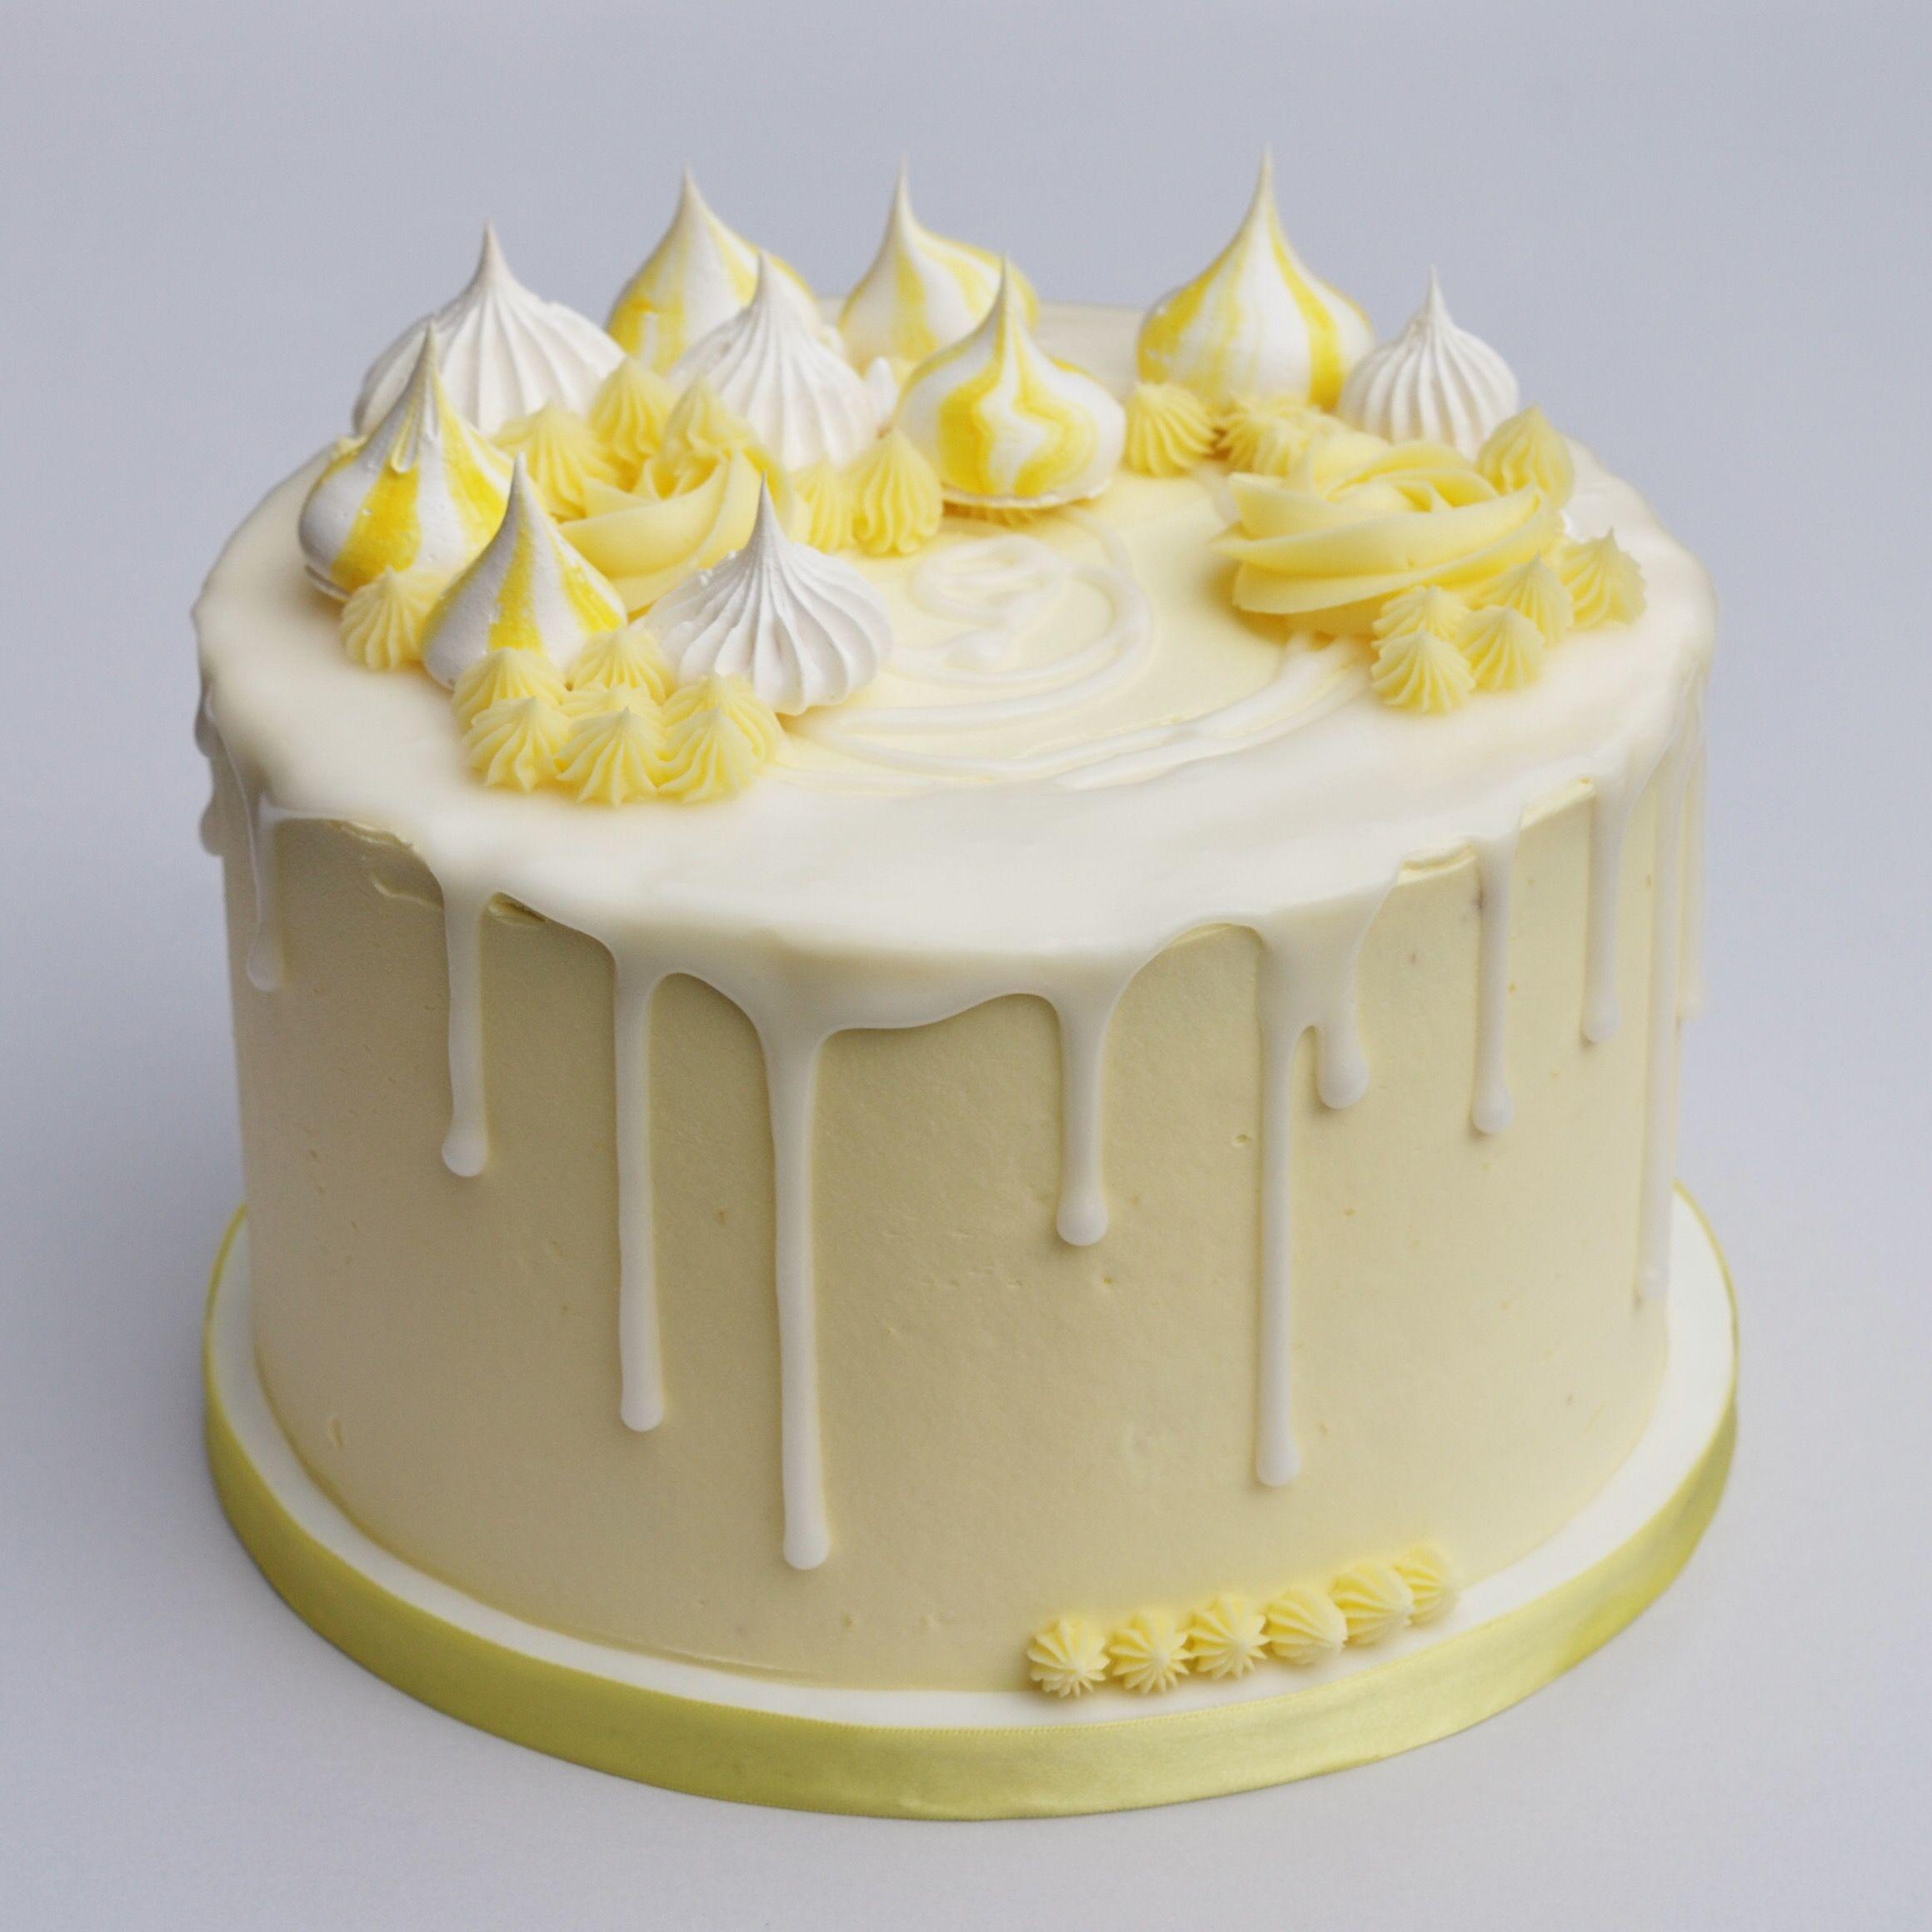 Lemon Meringue Drip Cake With Images Lemon Birthday Cakes